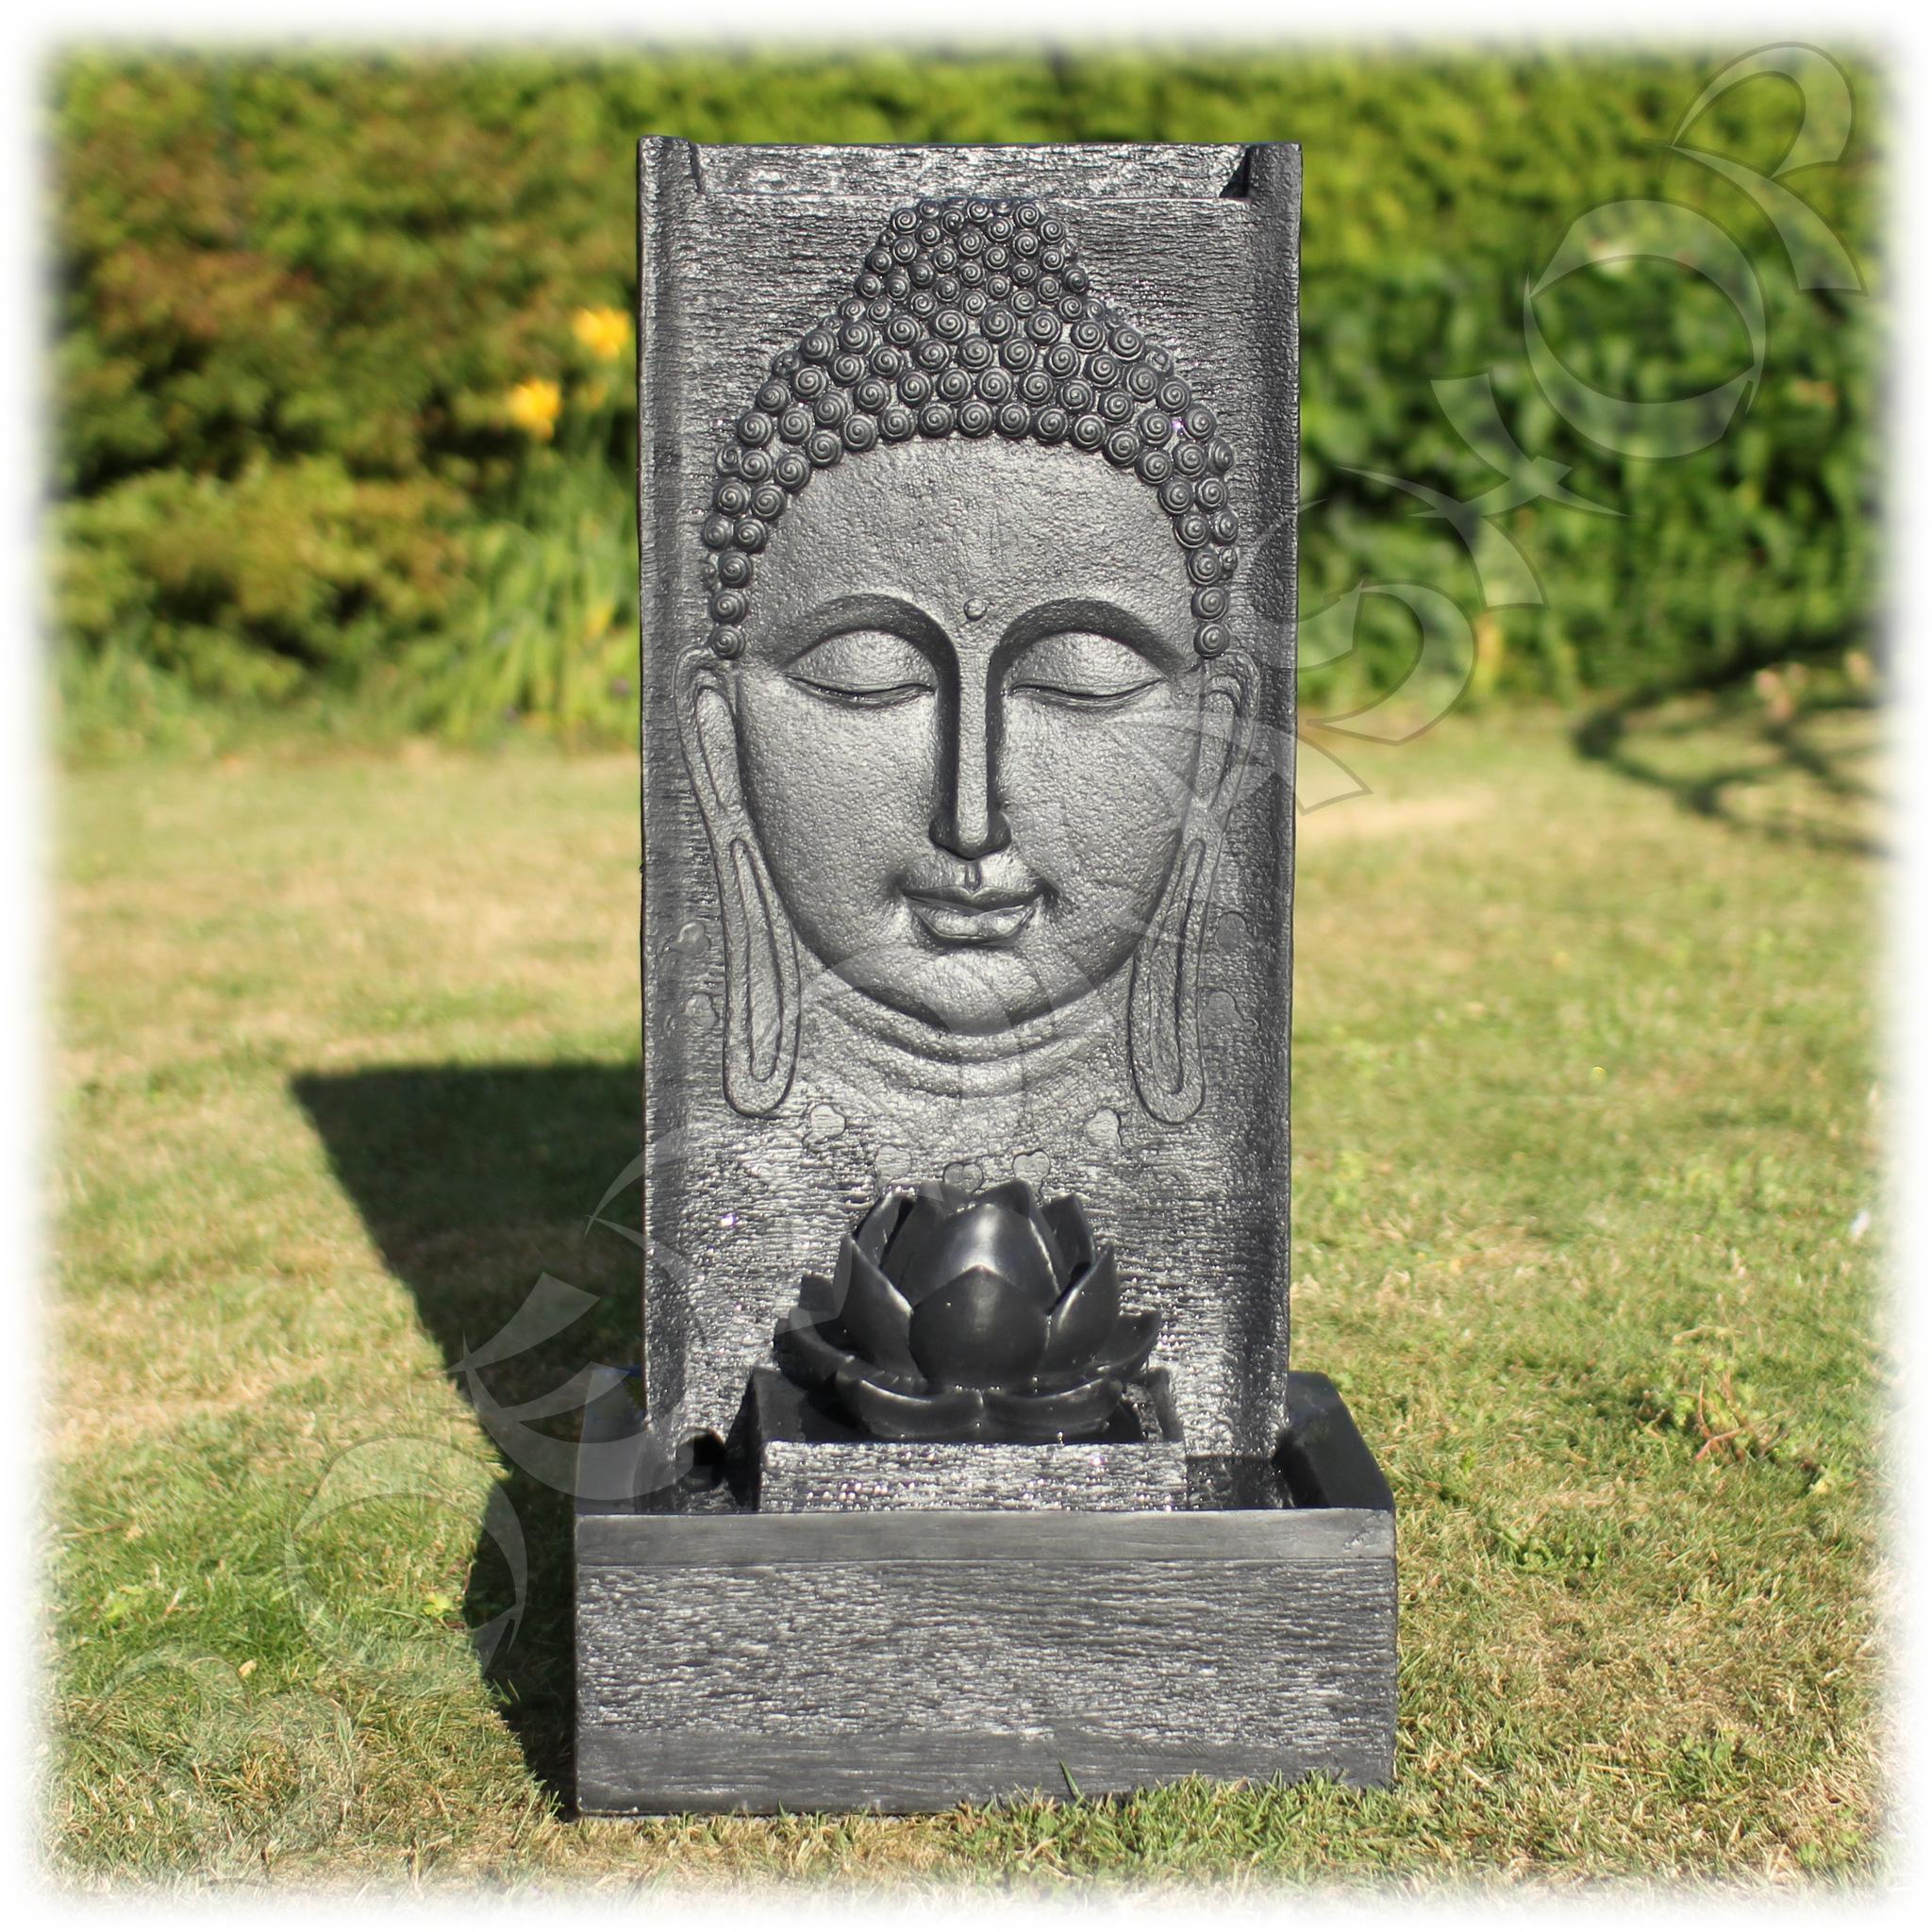 Boeddhabeeld Met Fontein.Fontein Thaise Boeddha Met Lotusbloem